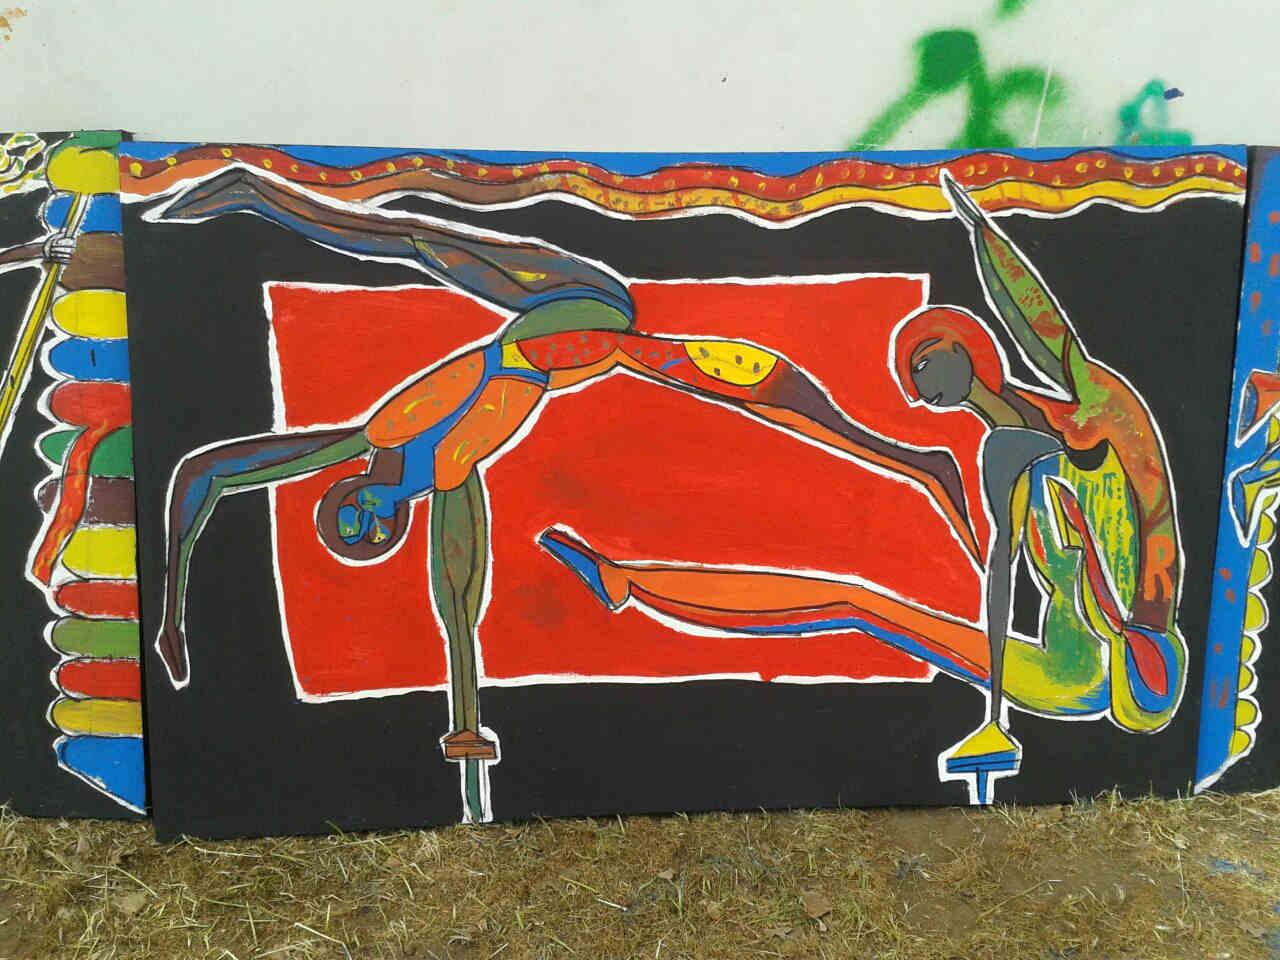 alejandro mono gonzalez